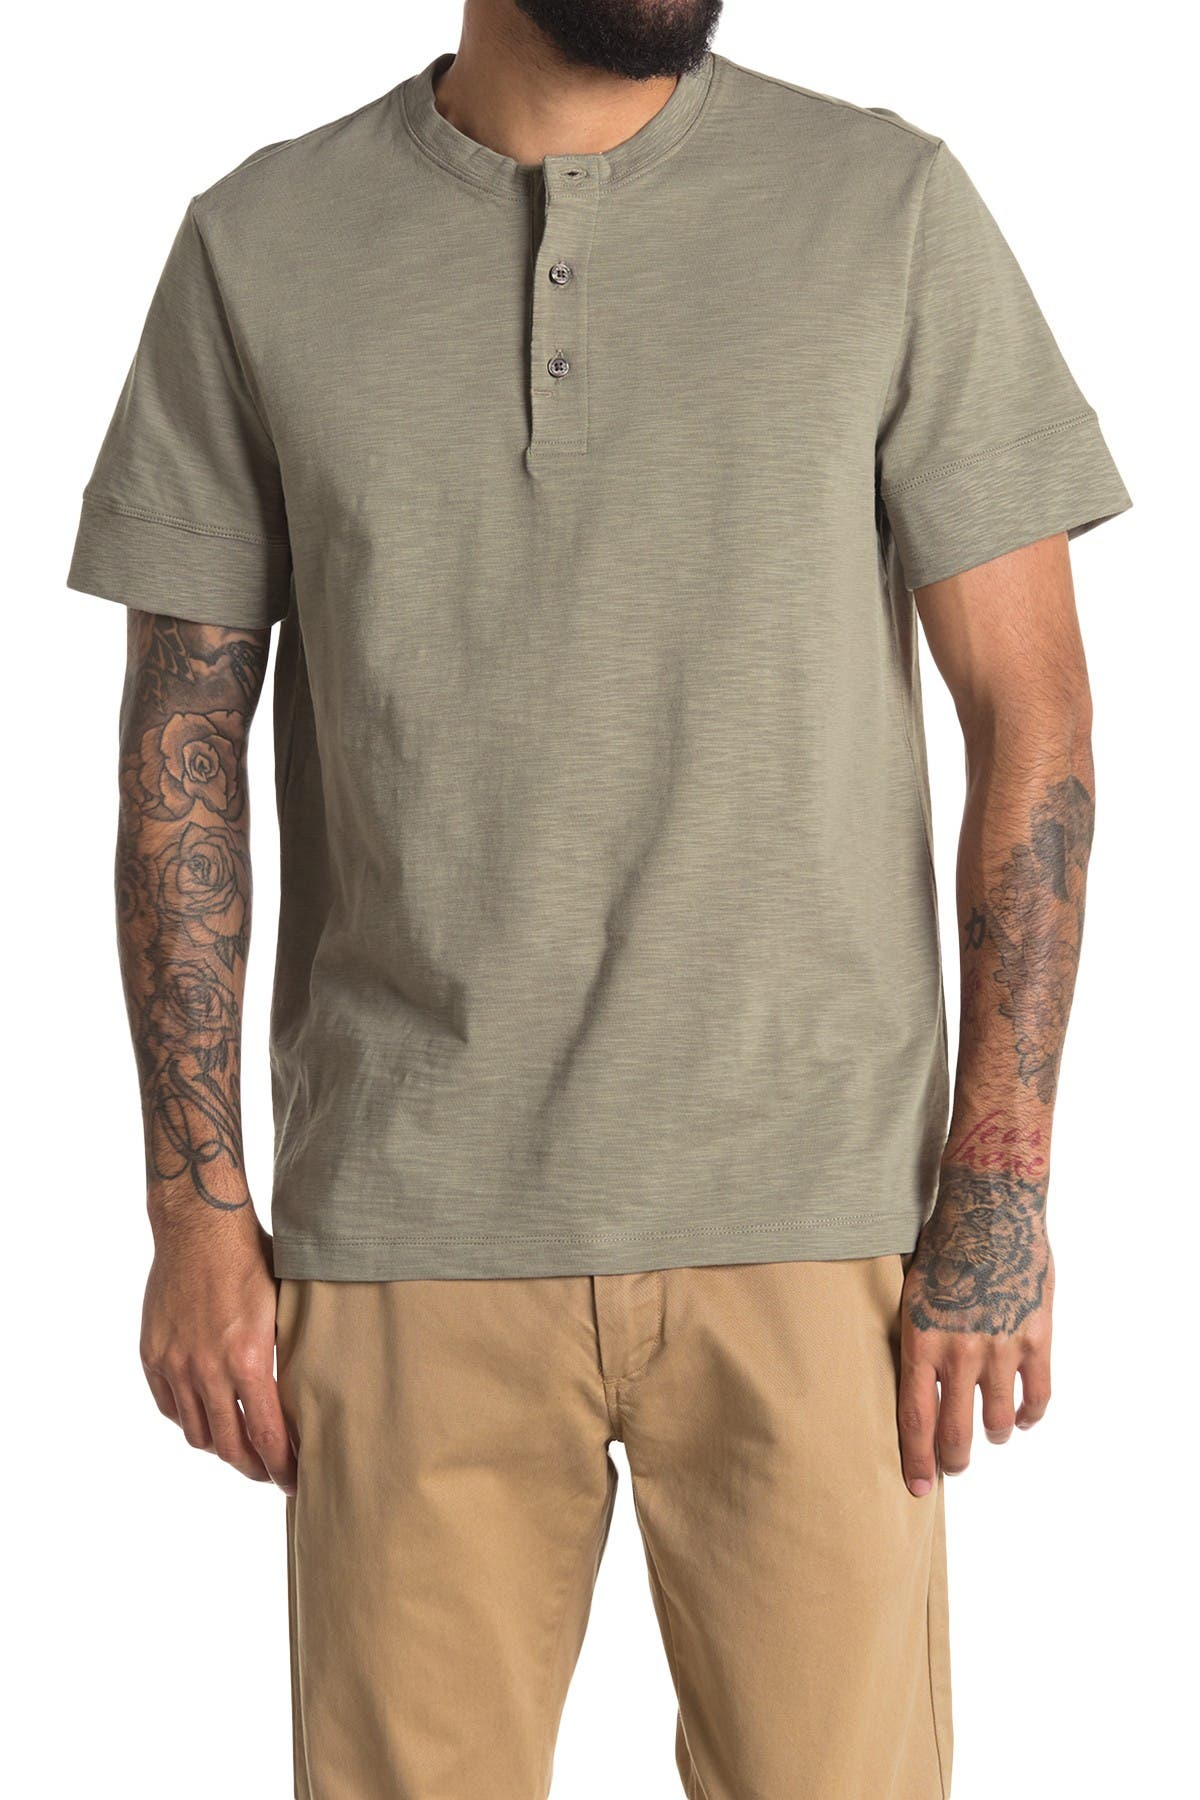 Image of DKNY Short Sleeve Henley Tee